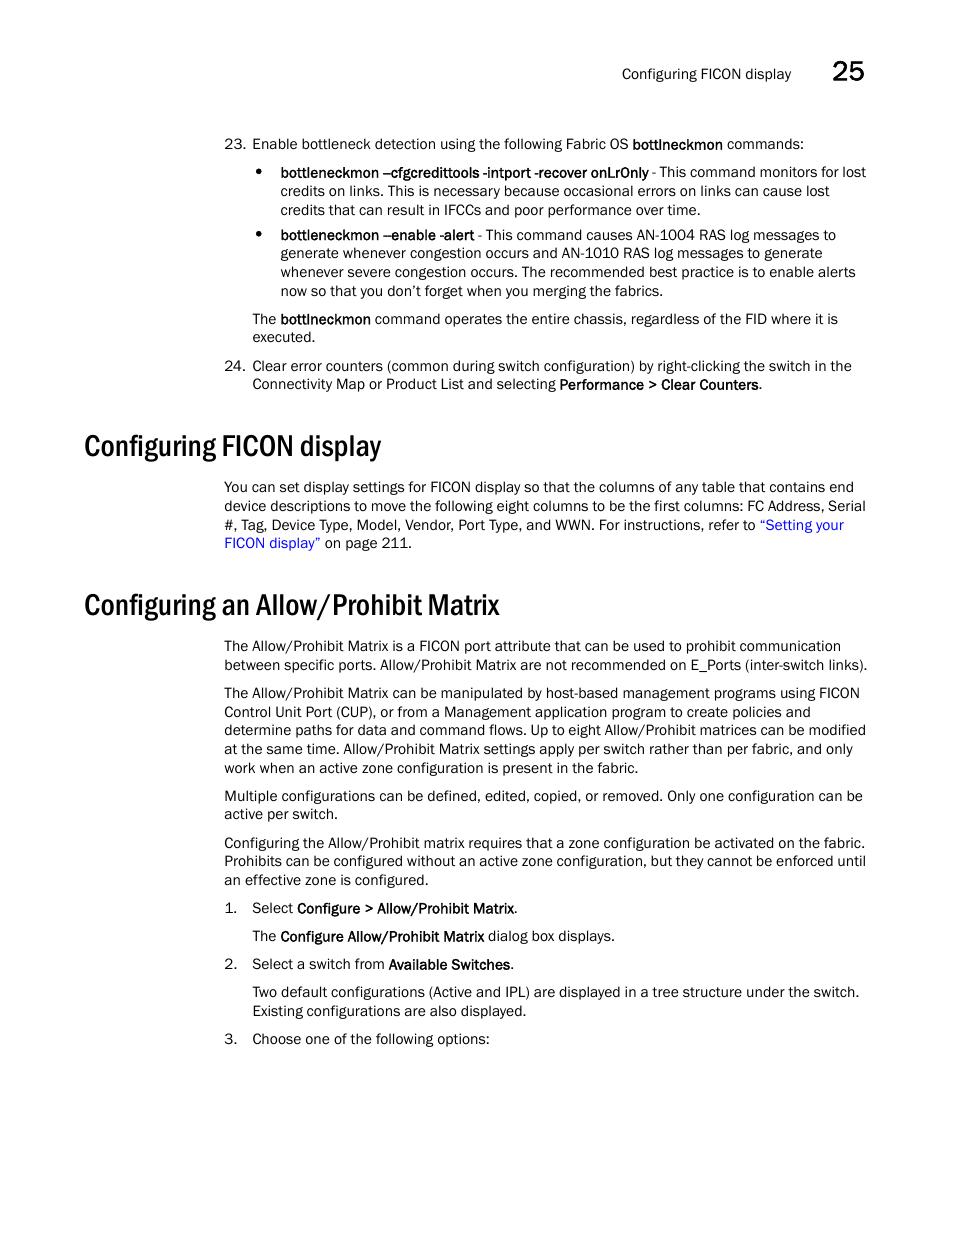 Configuring ficon display, Configuring an allow/prohibit matrix, Under |  Brocade Network Advisor SAN User Manual v12.1.0 User Manual | Page 949 /  1690